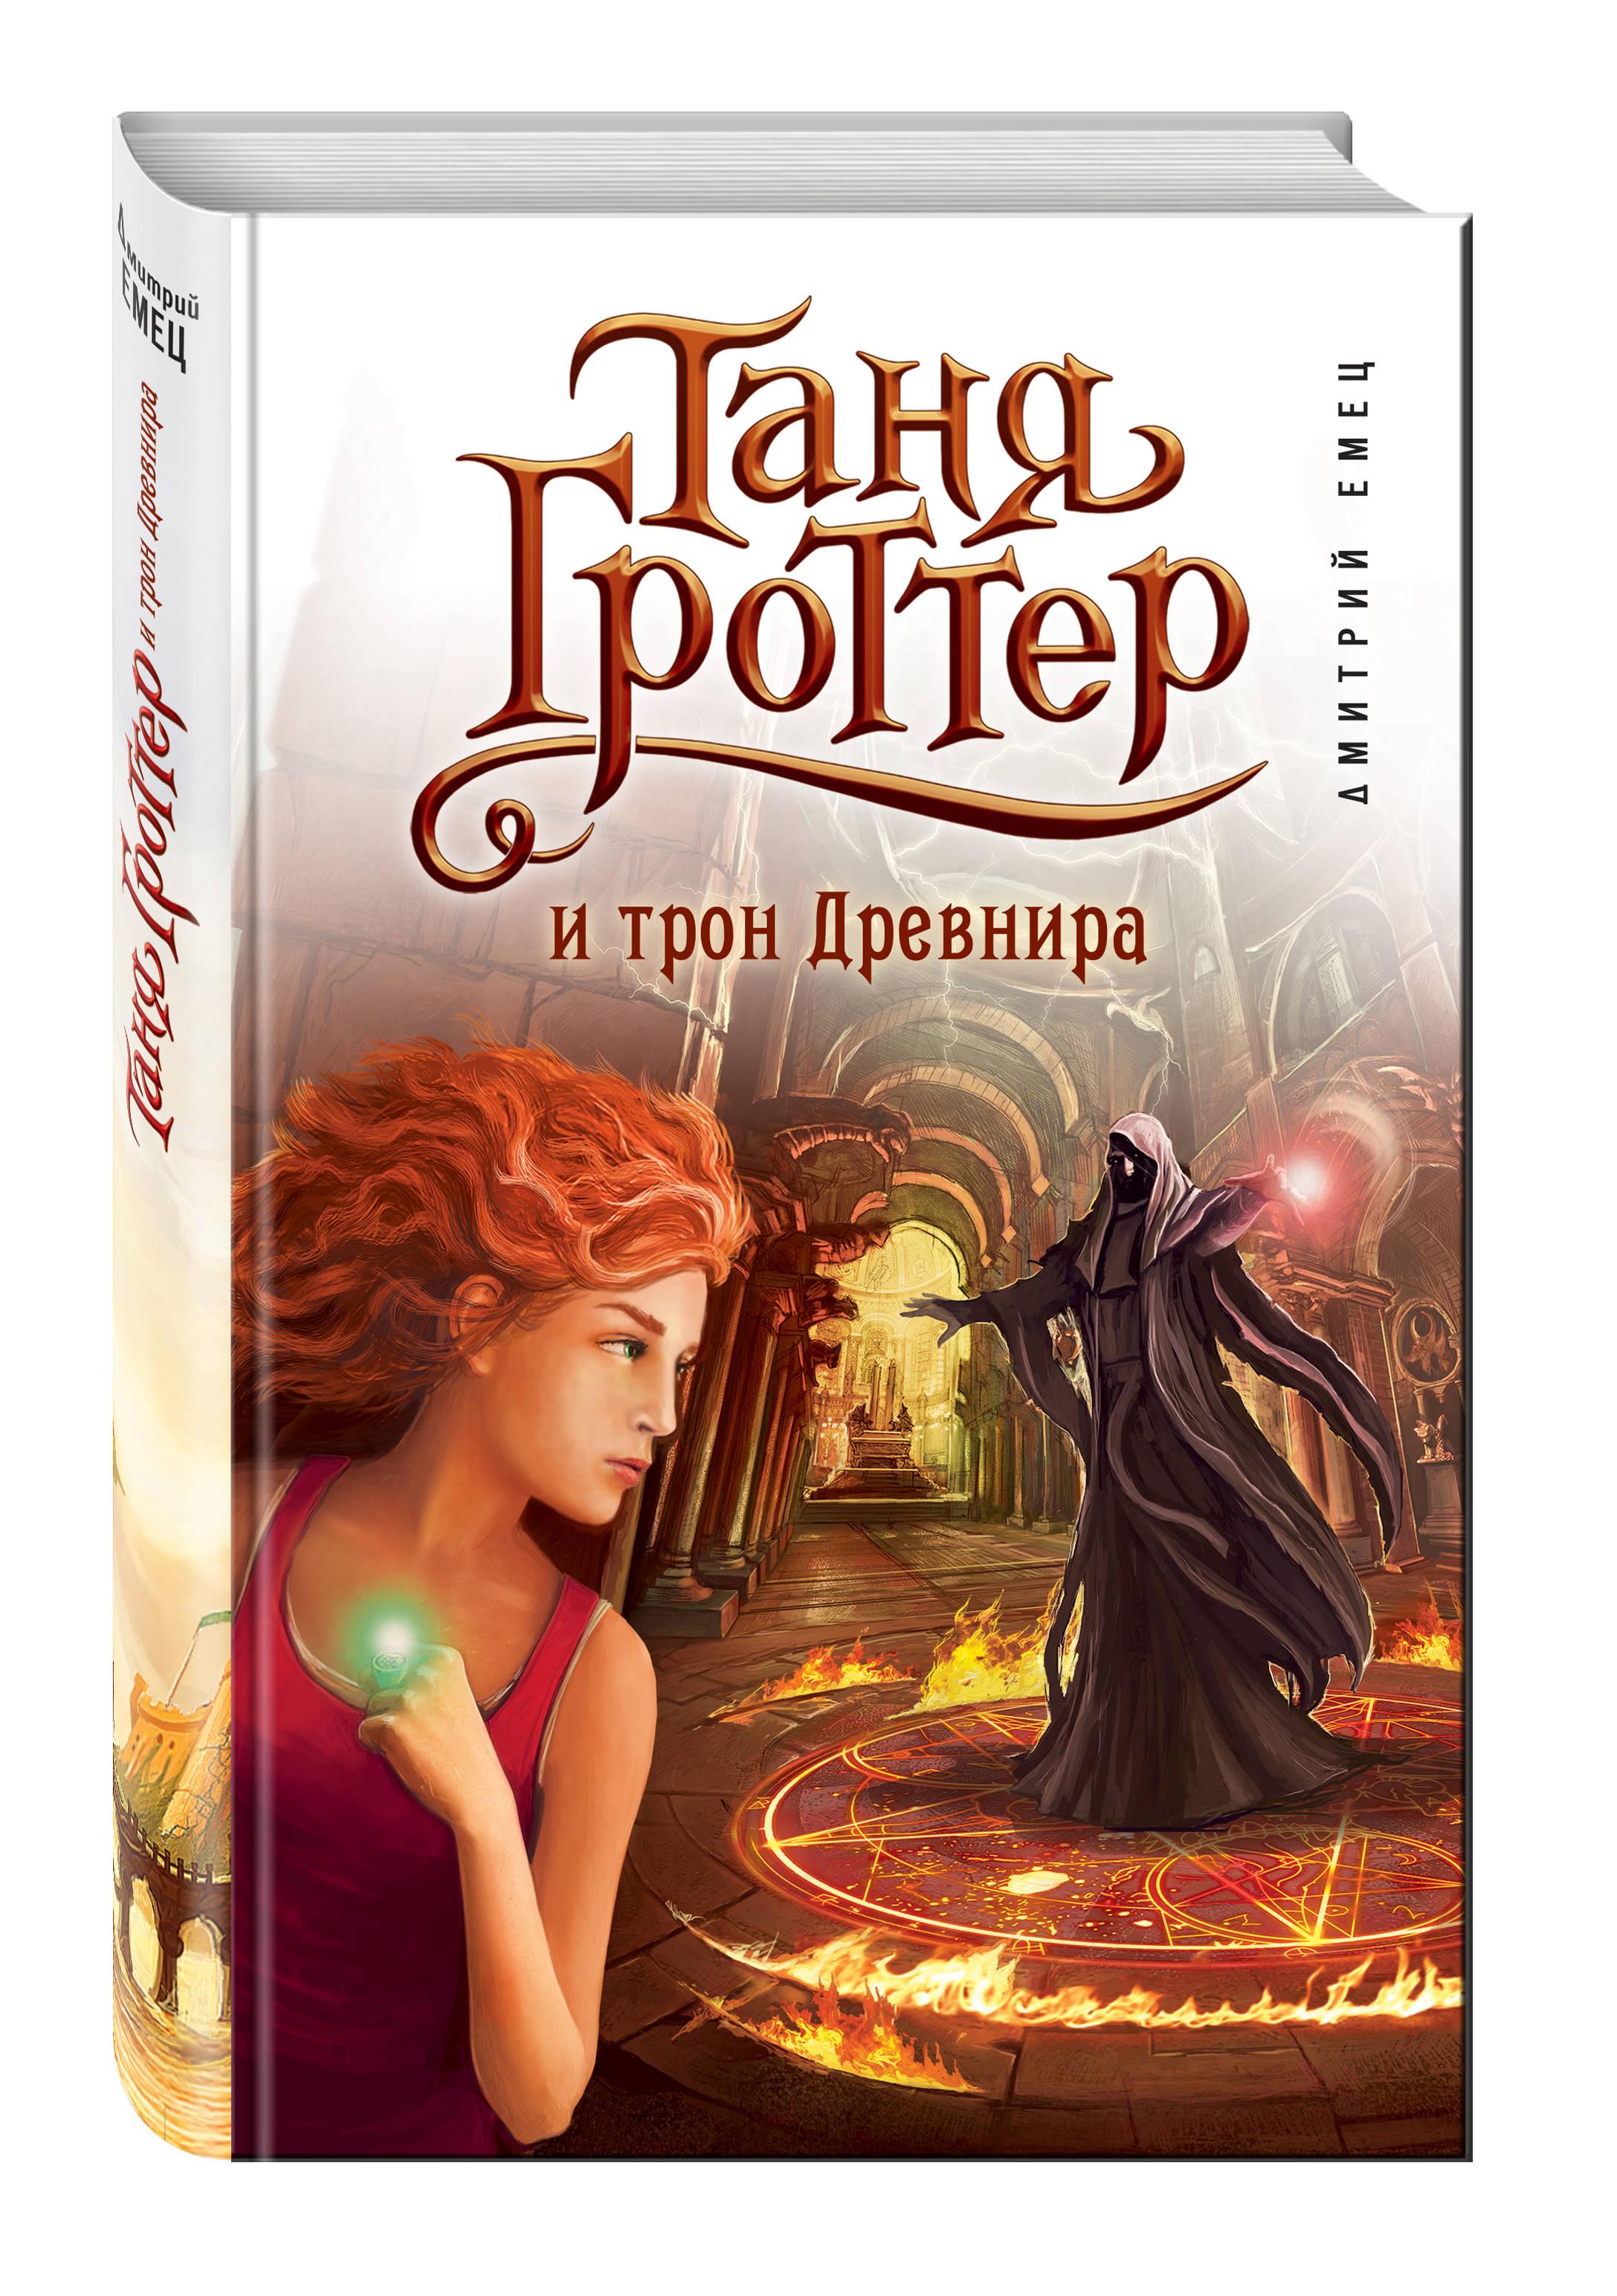 Емец Д.А. Таня Гроттер и трон Древнира